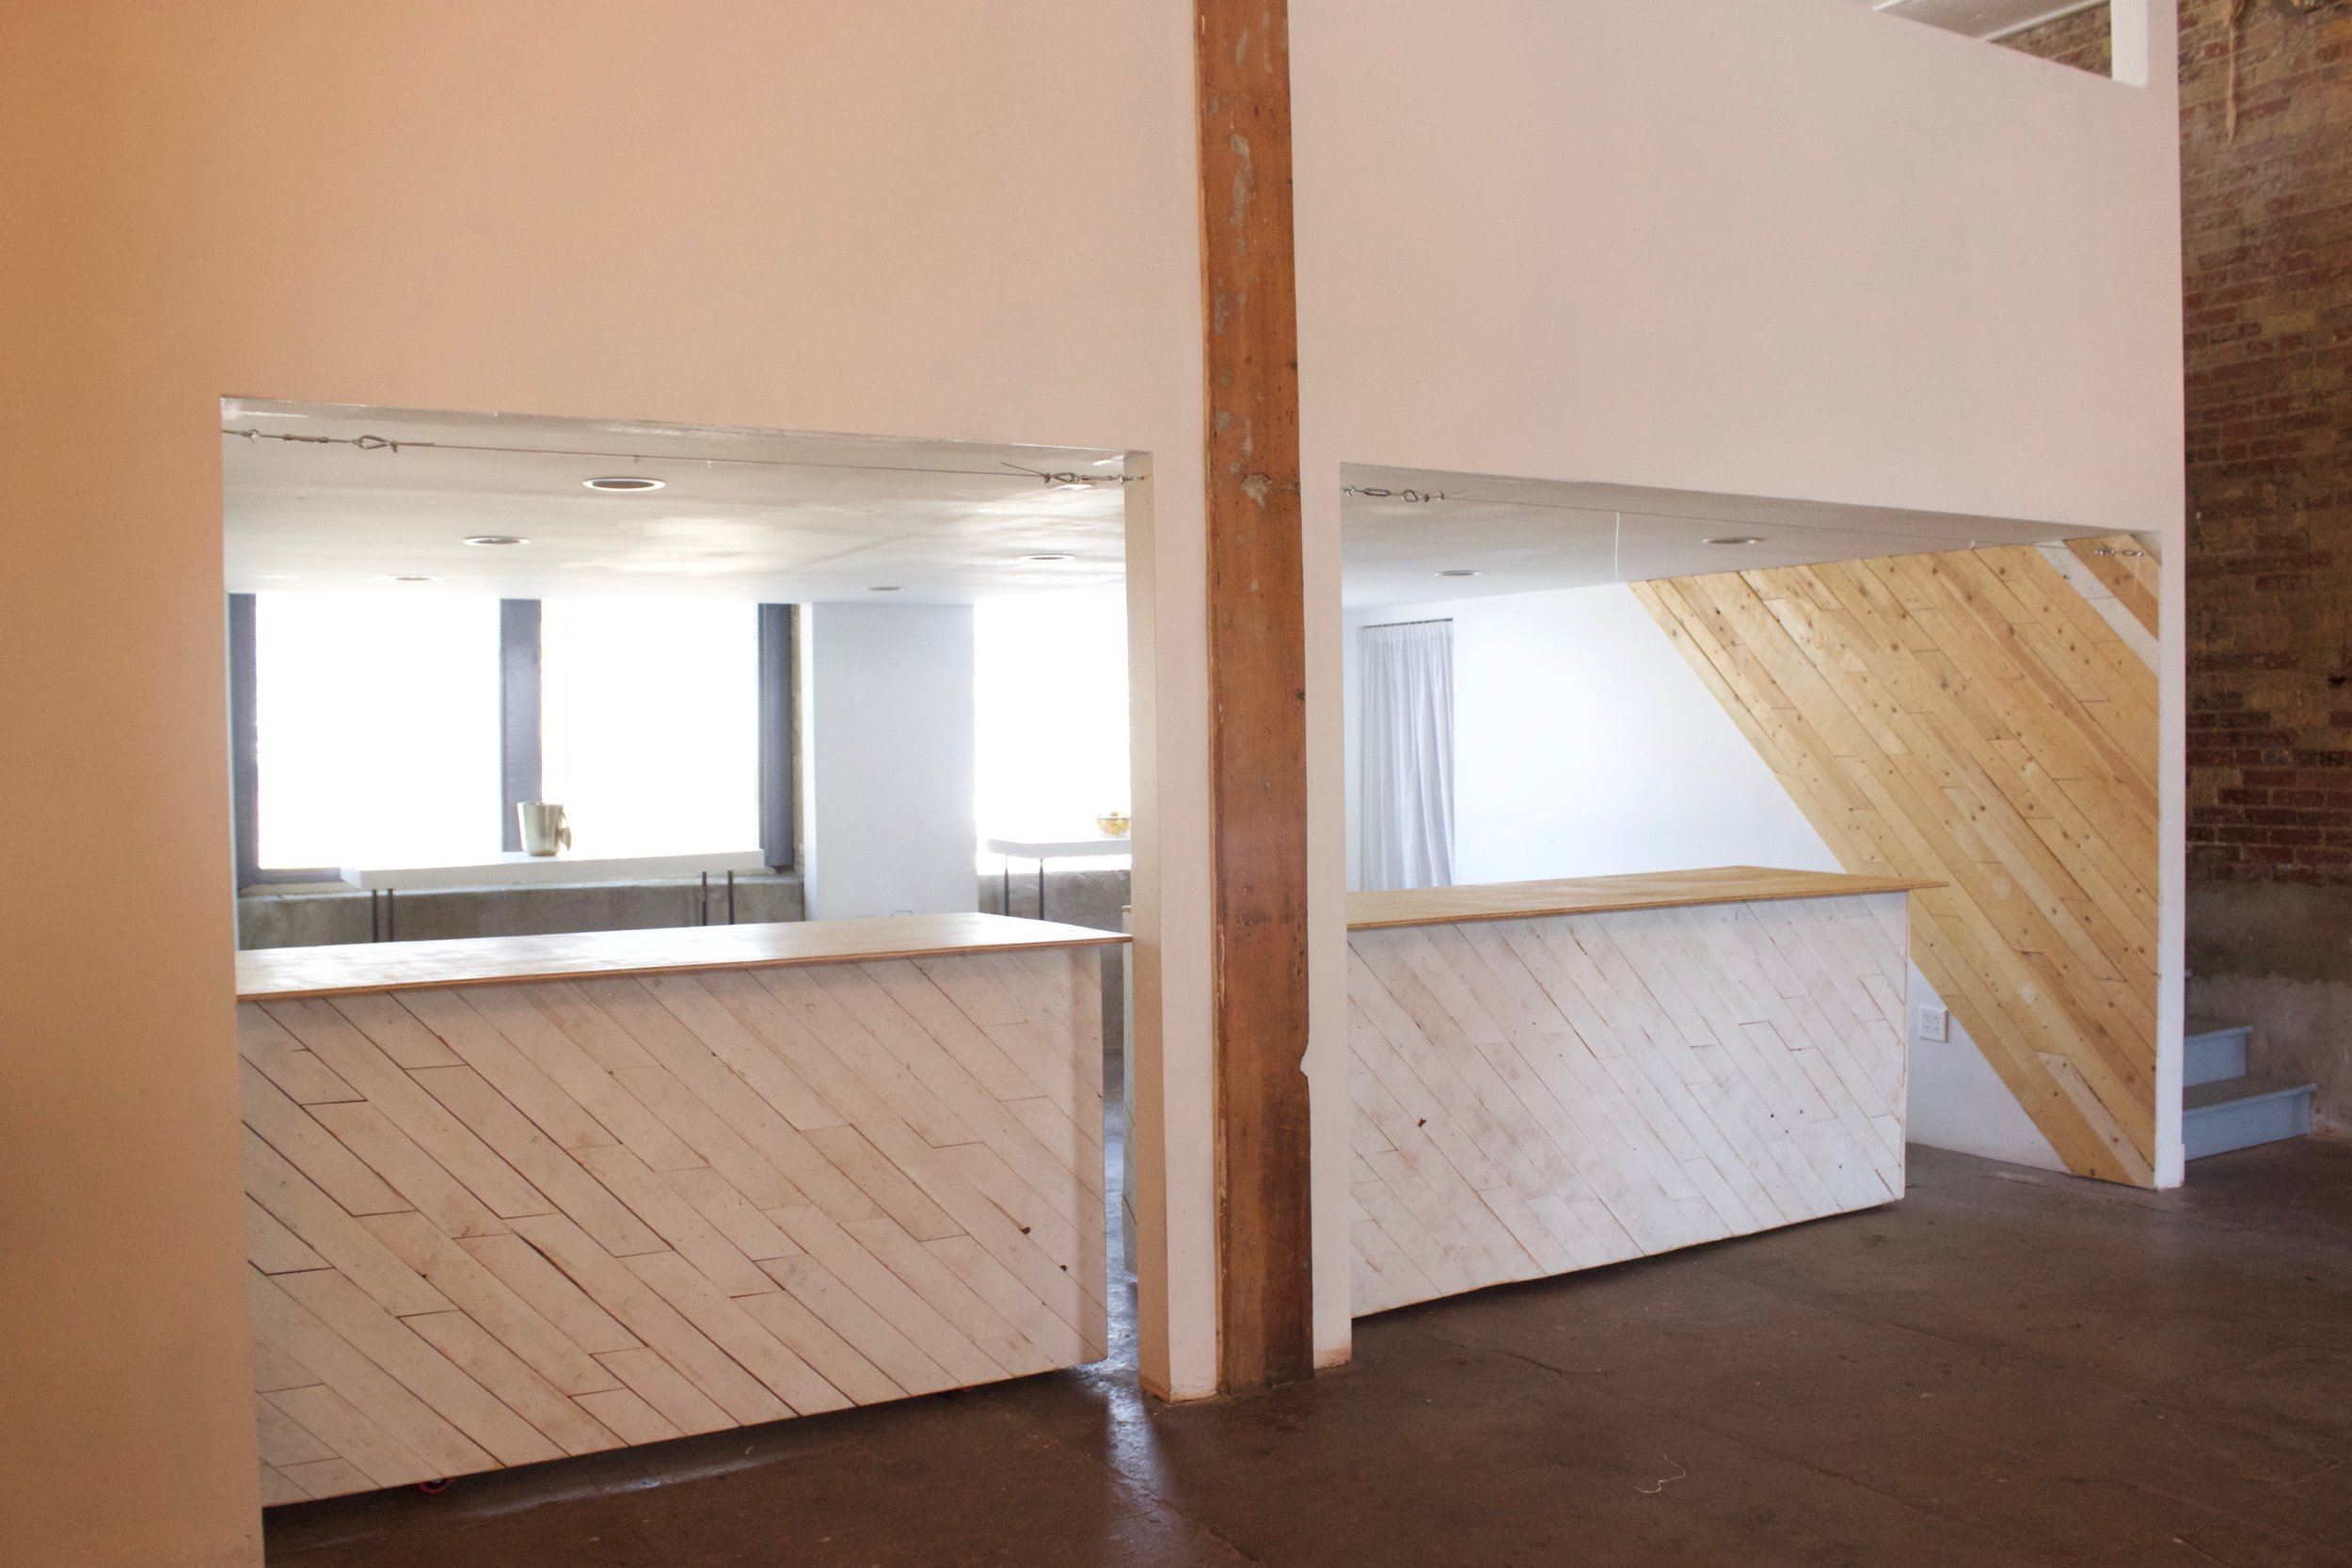 Wooden Mobile Bars (Spark or Full Venue only)